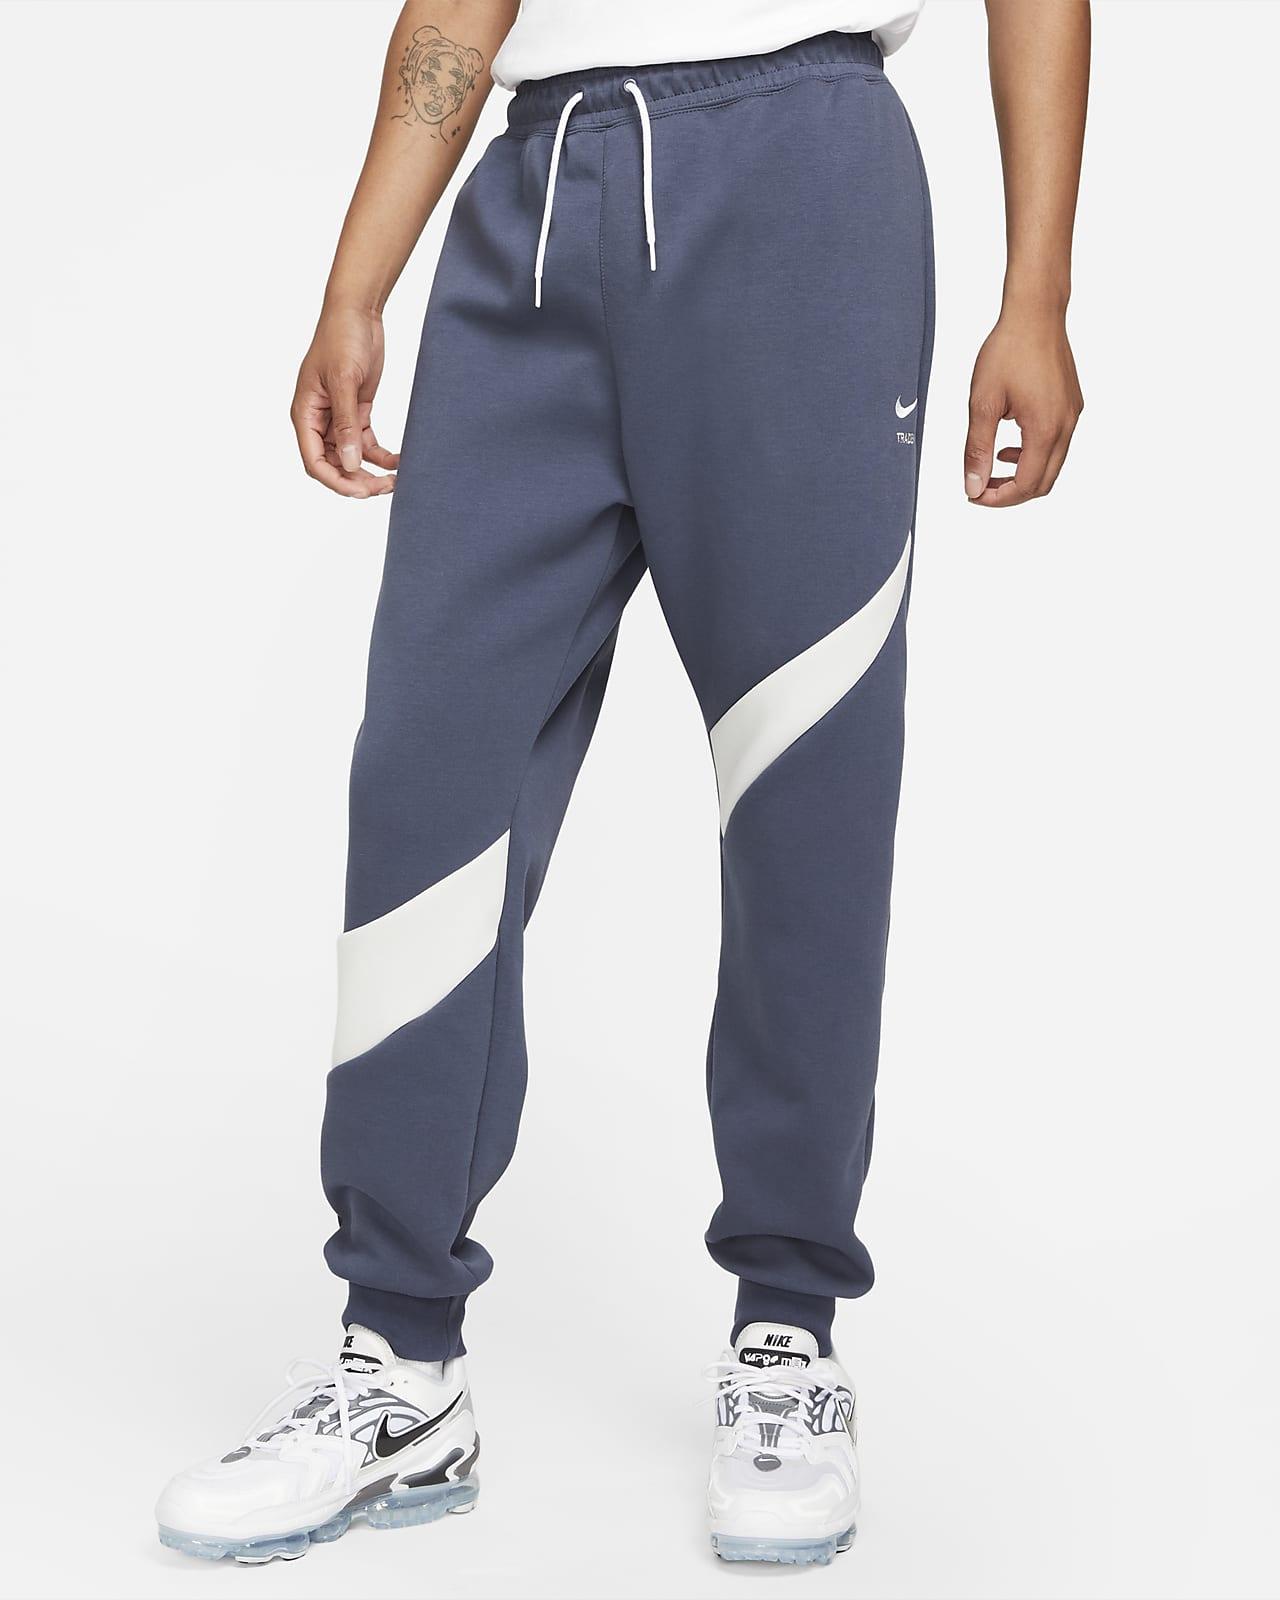 Pánské kalhoty Nike Sportswear Swoosh Tech Fleece